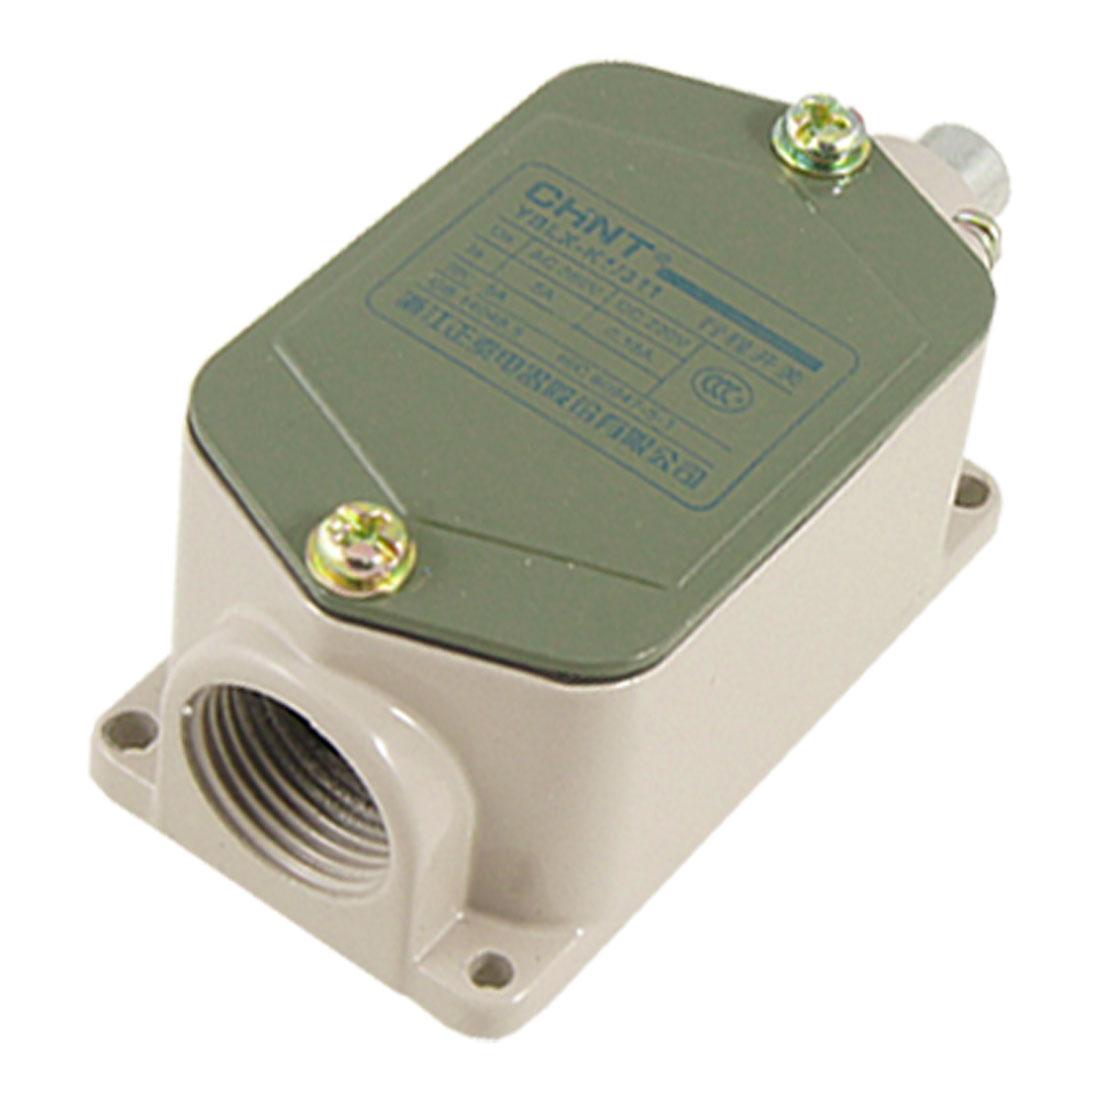 YBLXK1-311 AC 380V/5A DC 220V/0.15A Pin Plunger Actuator Limit Switch